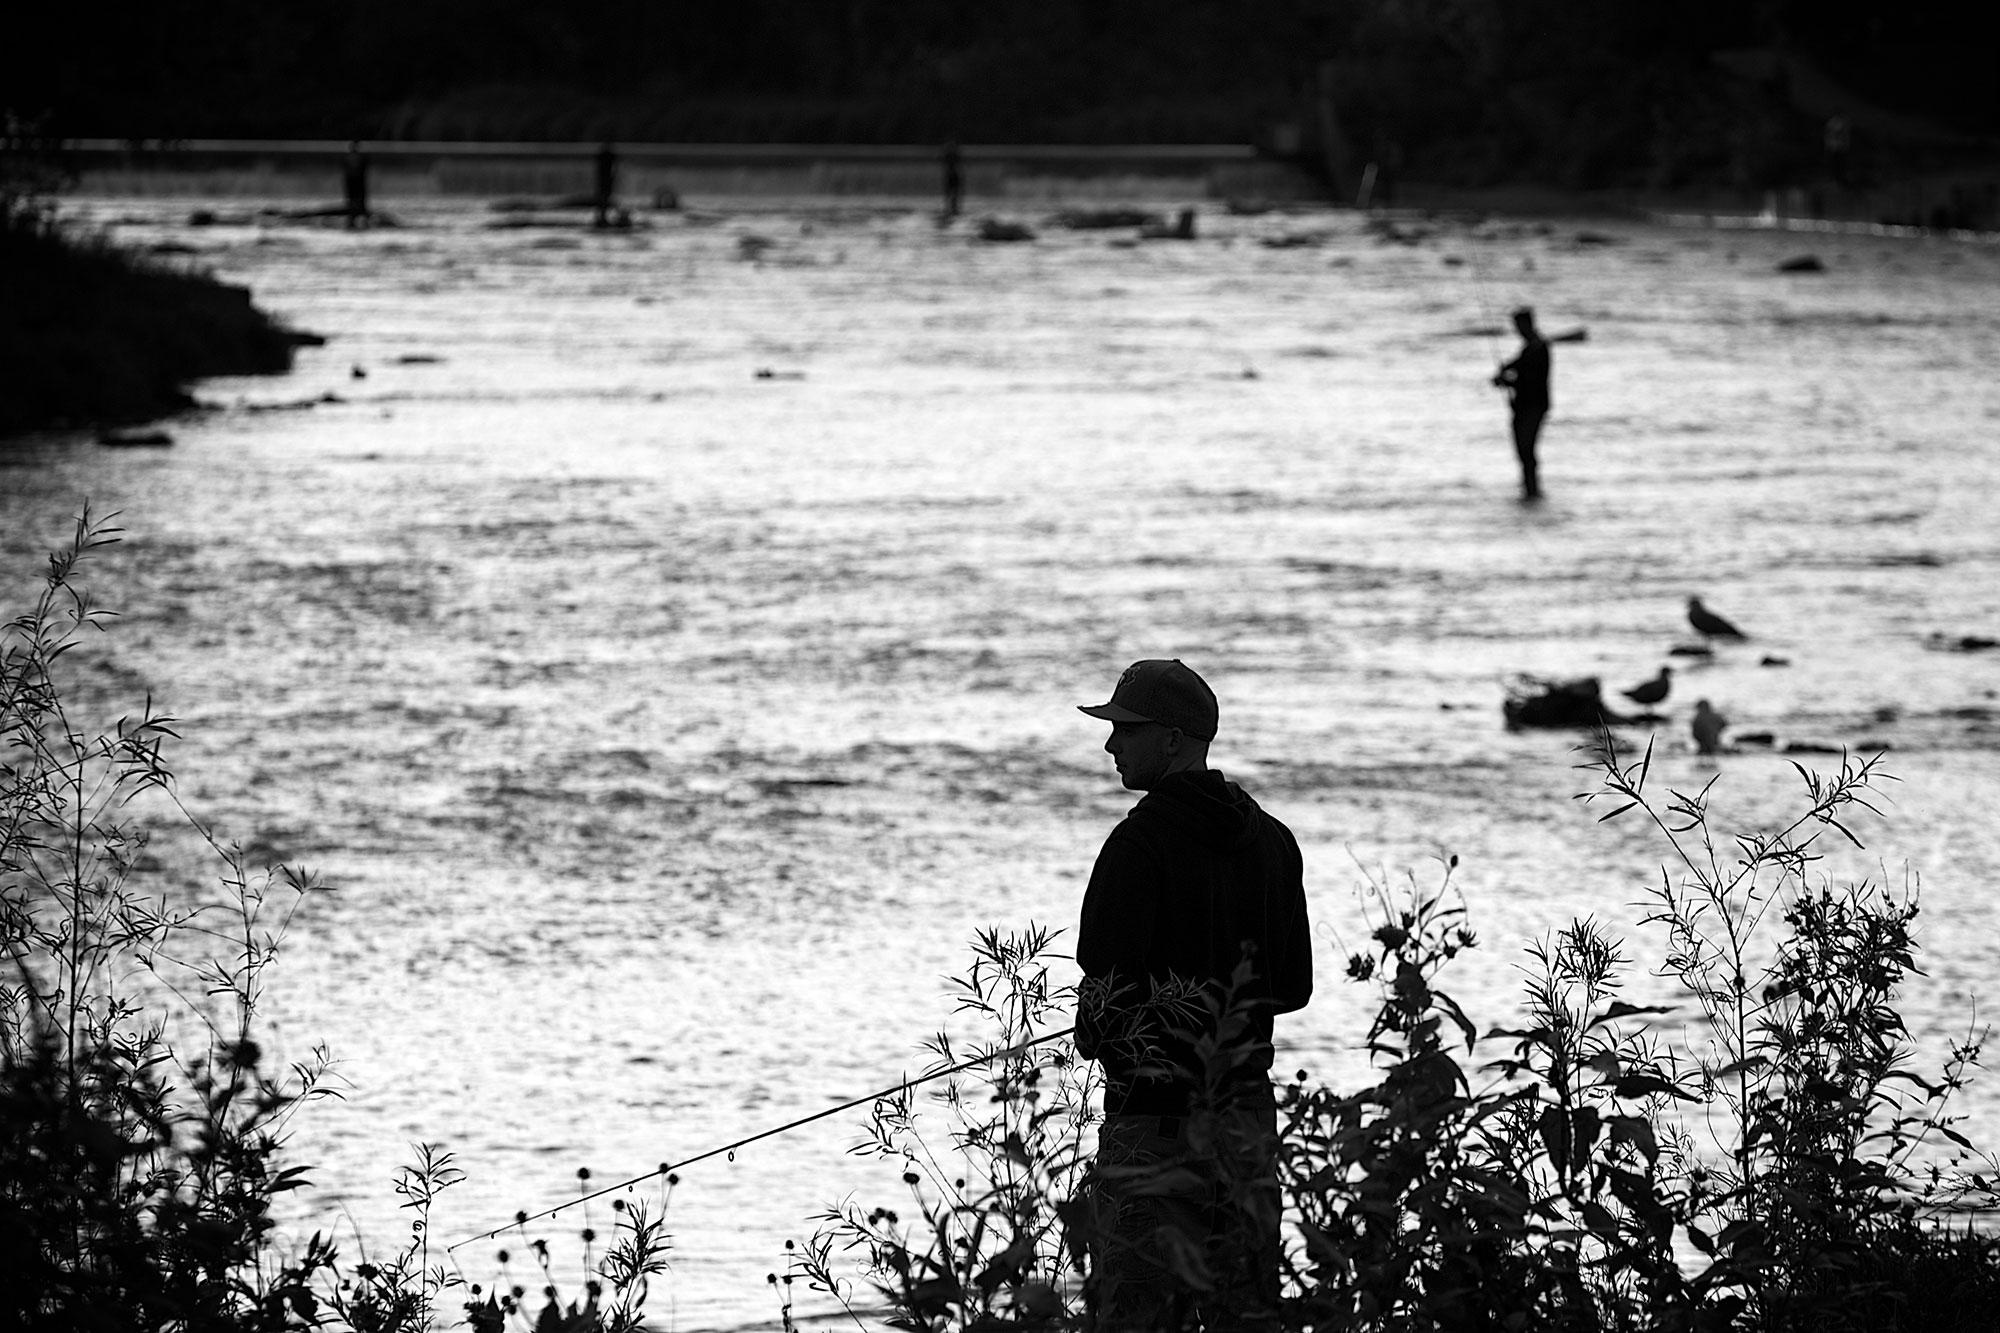 Fishermen trying their luck along the Humber River. (Photo via Lake Ontario Waterkeeper)